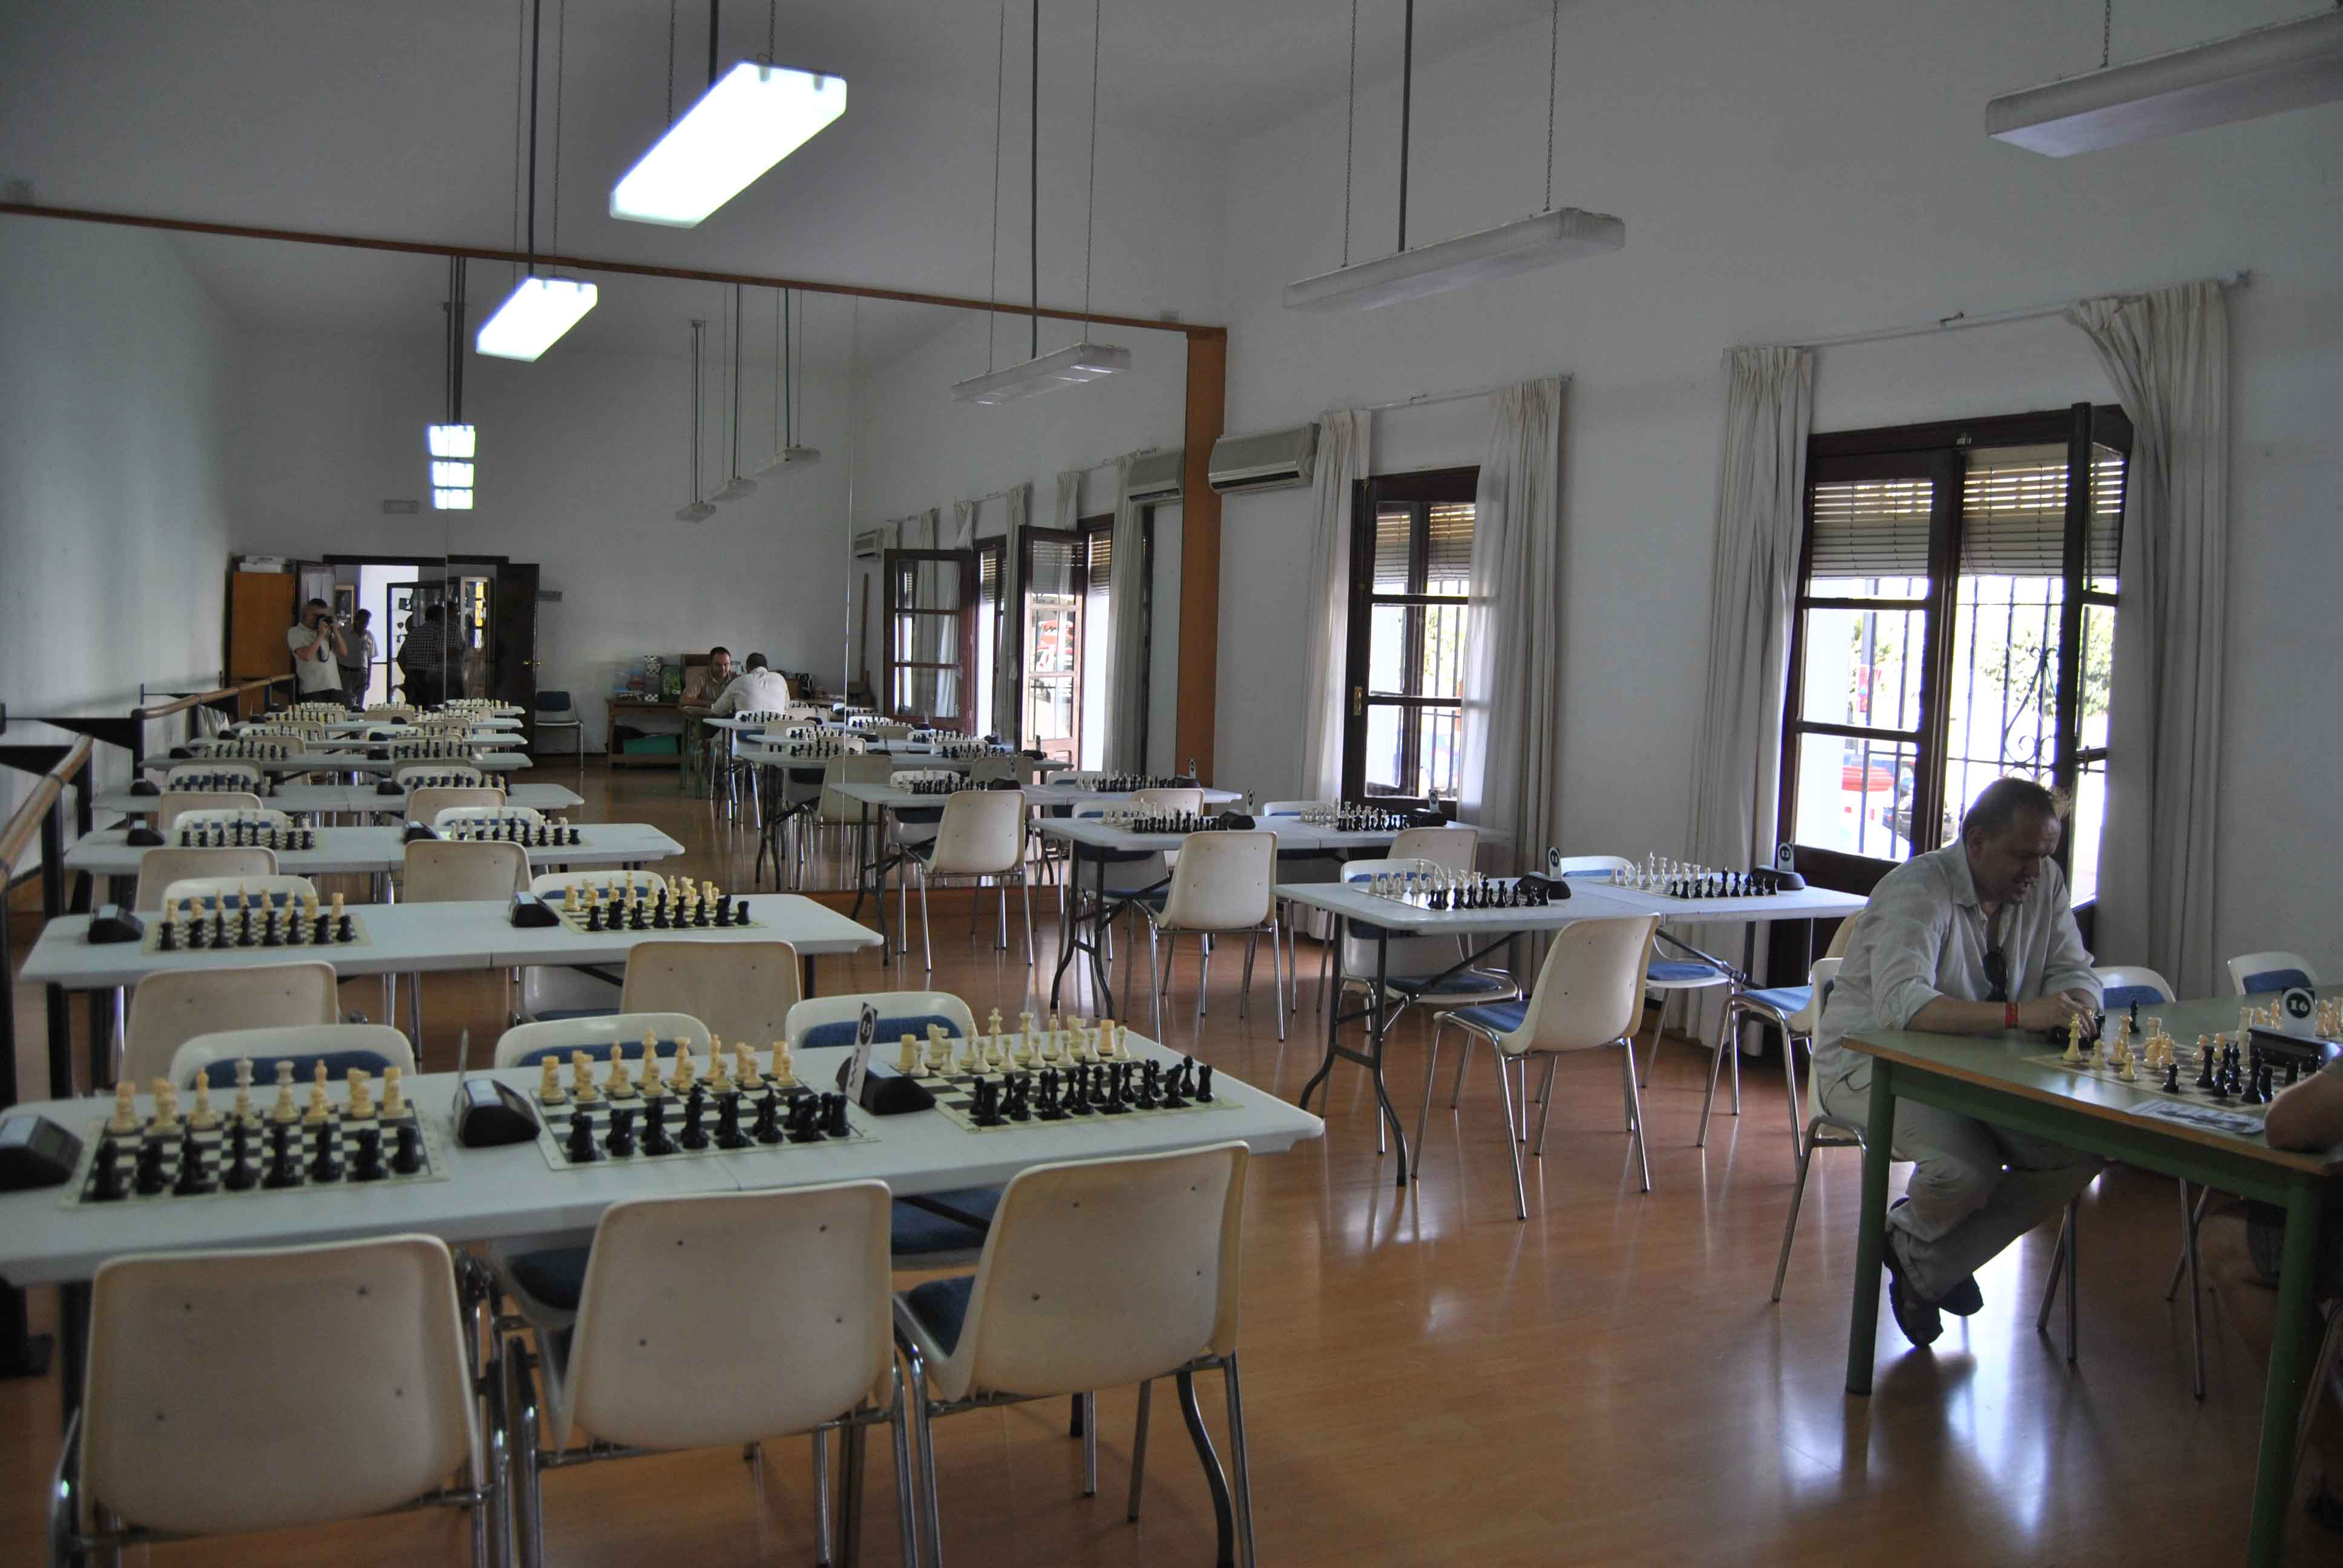 La sala, antes del comienzo